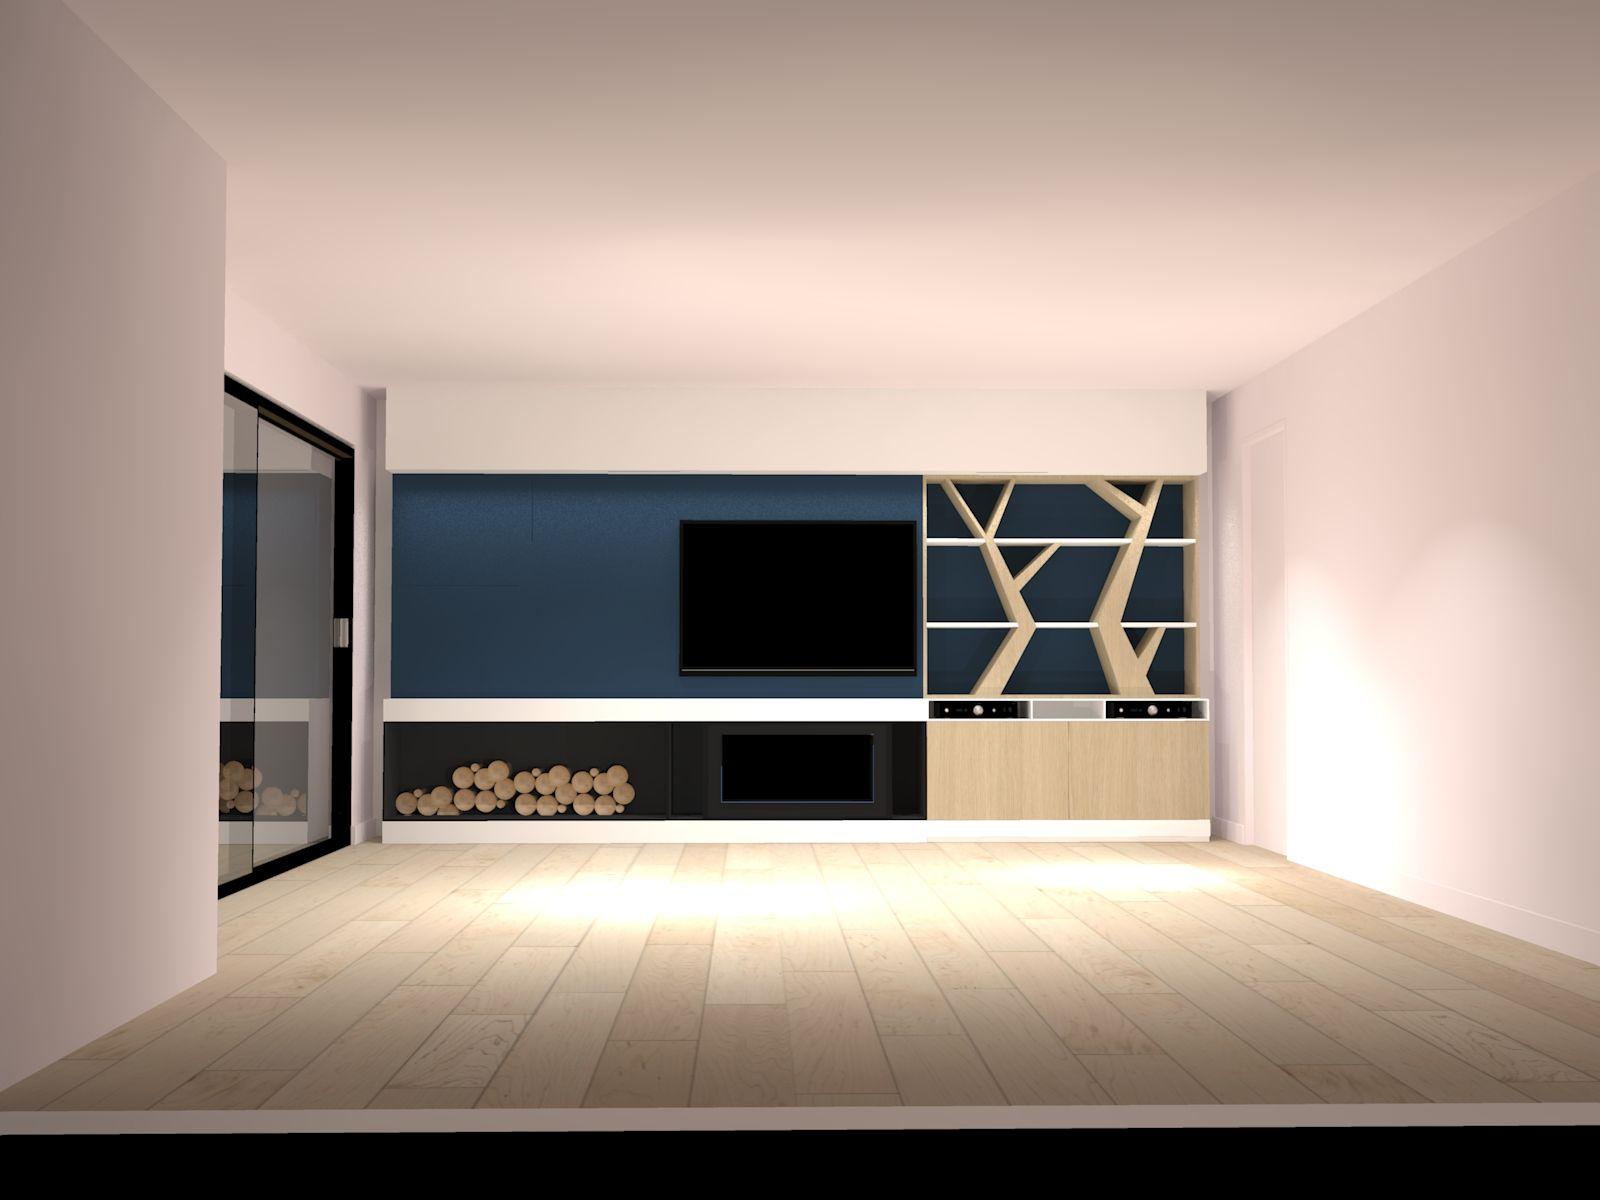 3d Design Démesure Bibliothèque Meuble Tv Arbre Mur Bleu